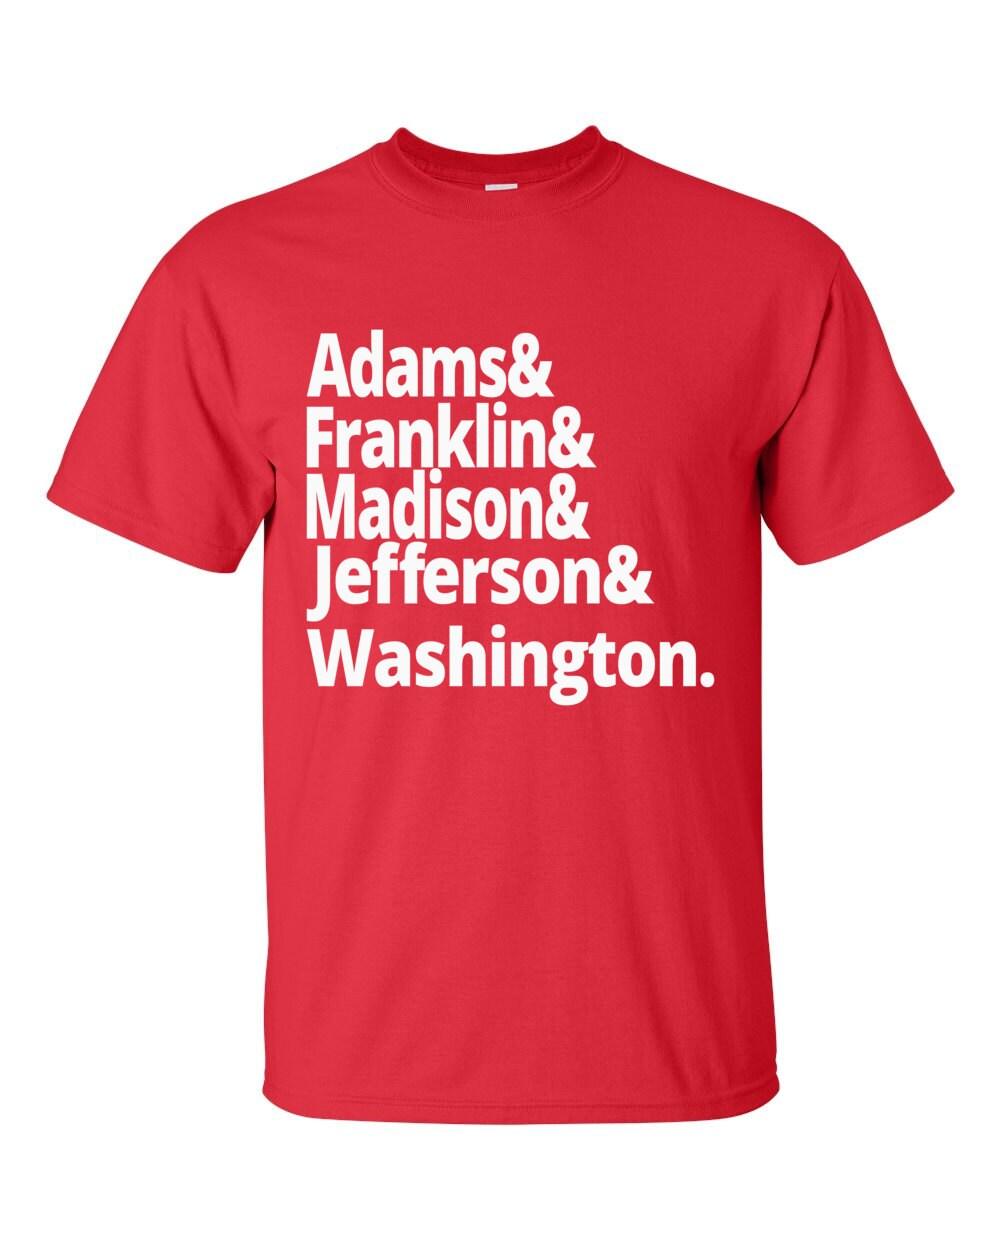 US History - American Founding Fathers - Adams, Franklin, Madison, Jefferson and Washington - US History T-shirt